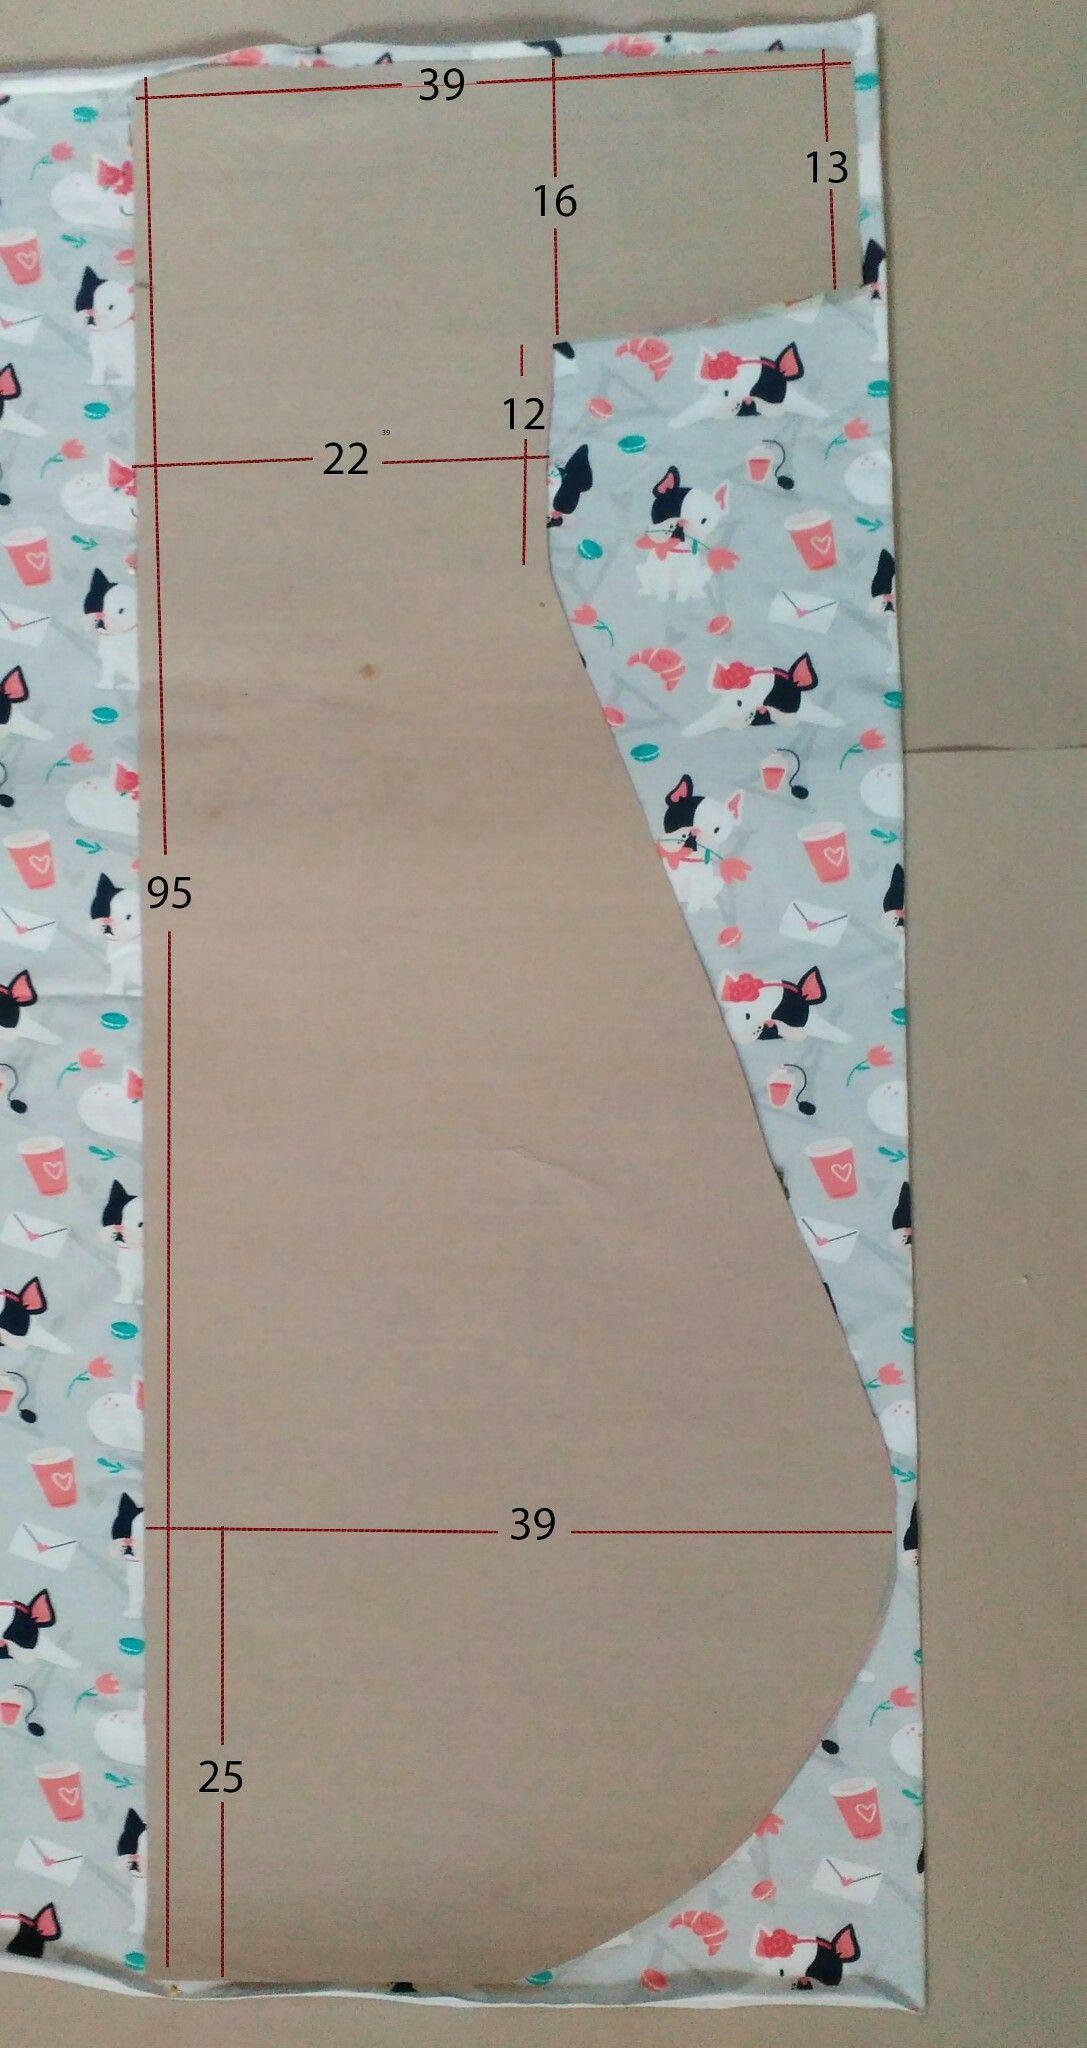 Pin by on channing tatum pinterest patterns sewing abaya pattern sew pattern dress sewing patterns sew mama sew hijab chic sewing tutorials sewing projects sewing ideas dressmaking jeuxipadfo Image collections